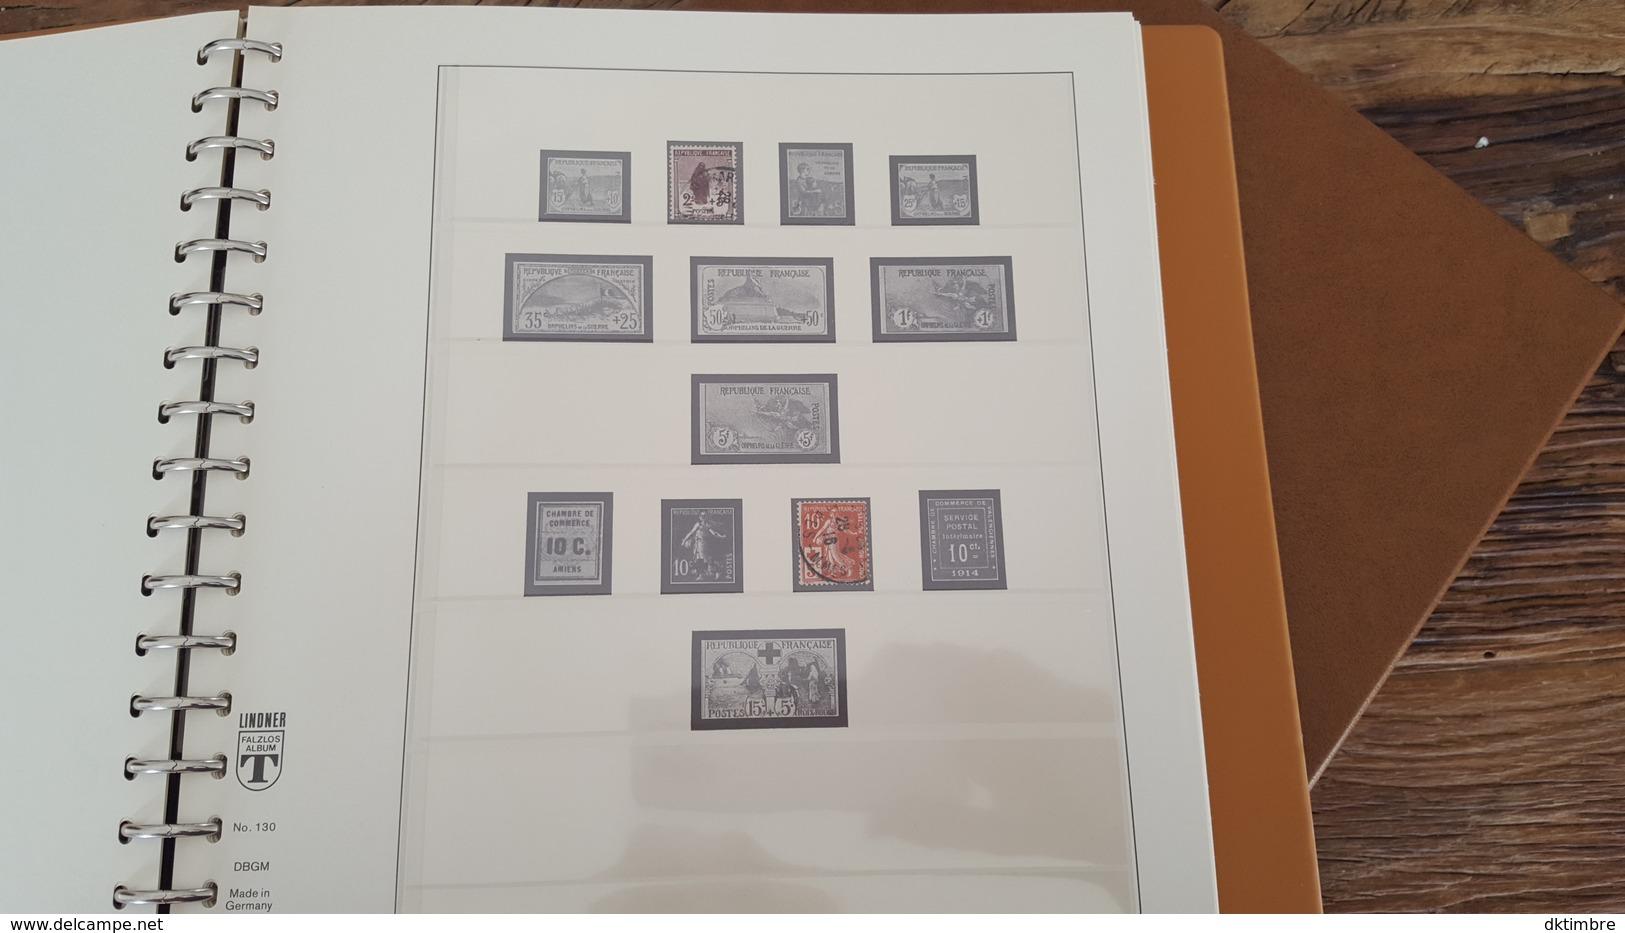 LOT 375678 ALBUM TIMBRE DE FRANCE LINDNER DE 1849 A 1940 TIMBRE NEUF* OBLITERE PORT A 10 EUROS - Sammlungen (im Alben)